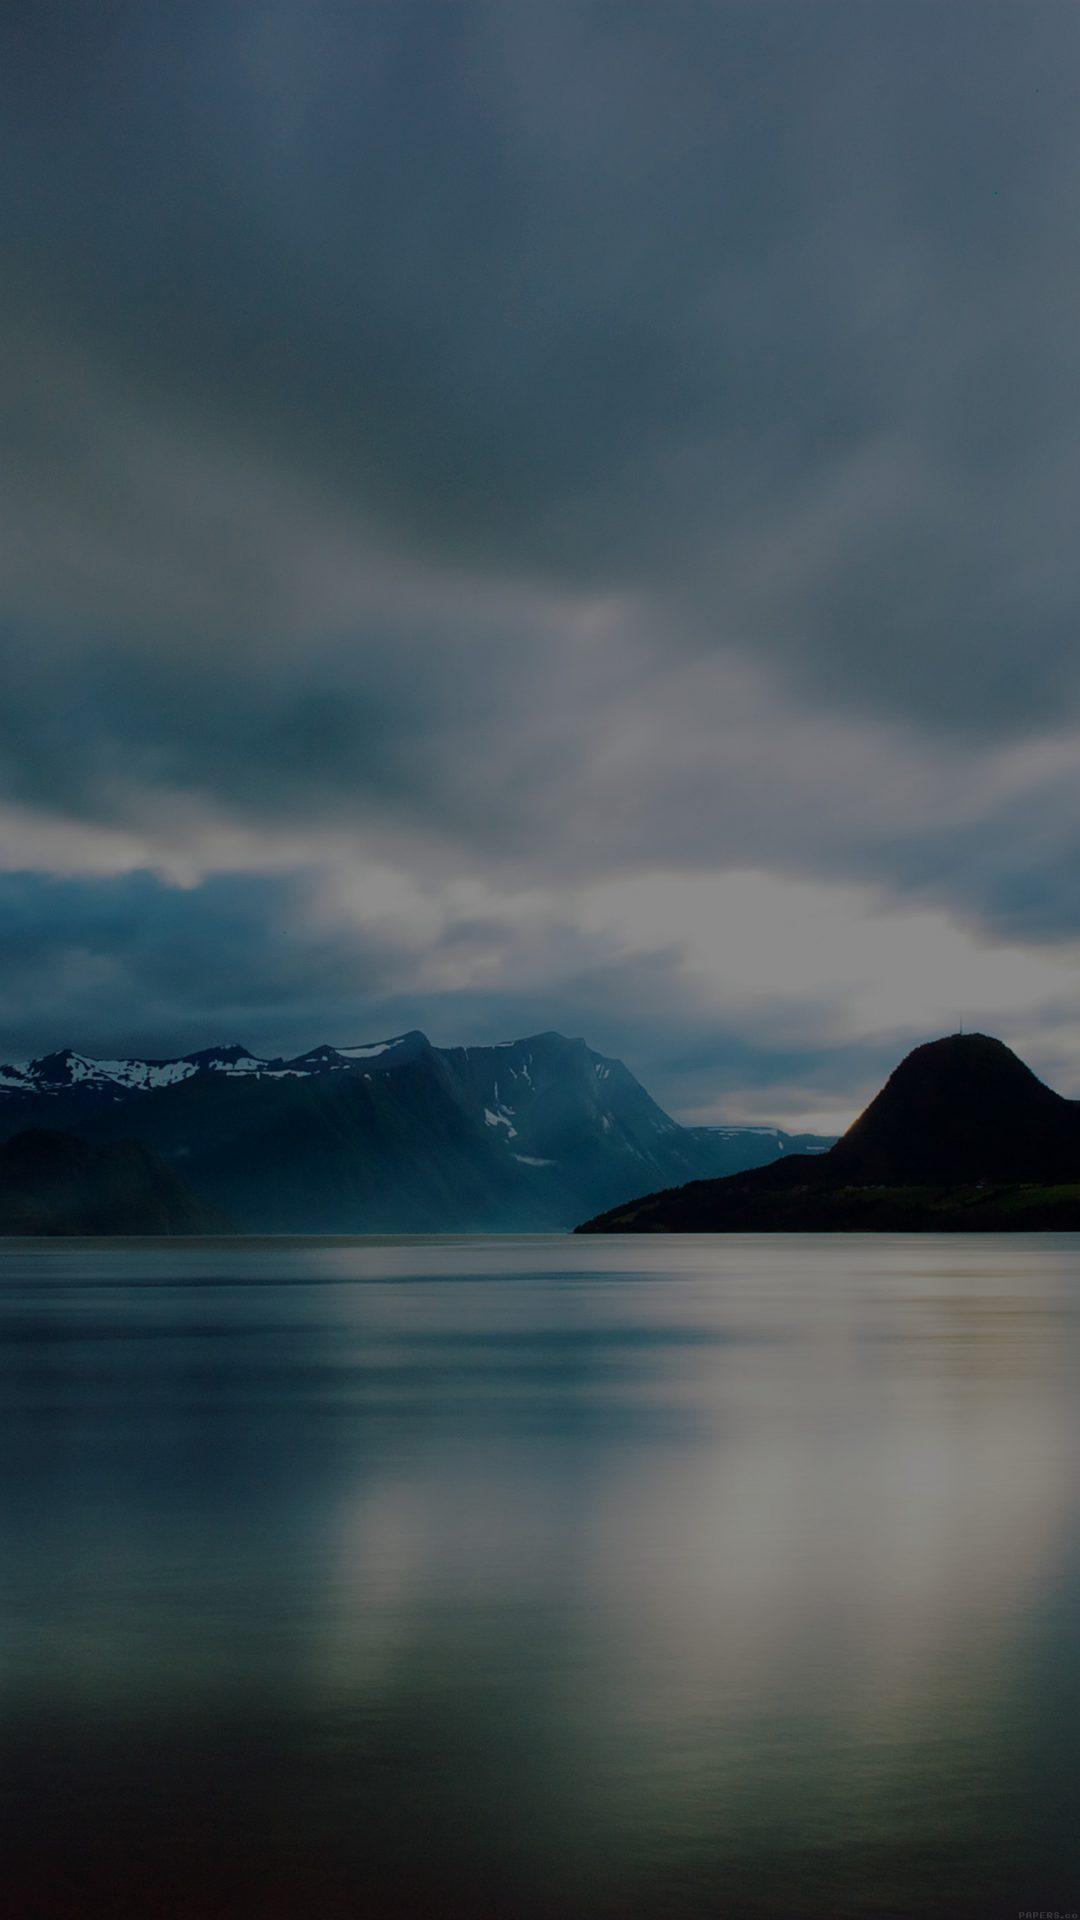 Lake Mountain Dark Calm Nature